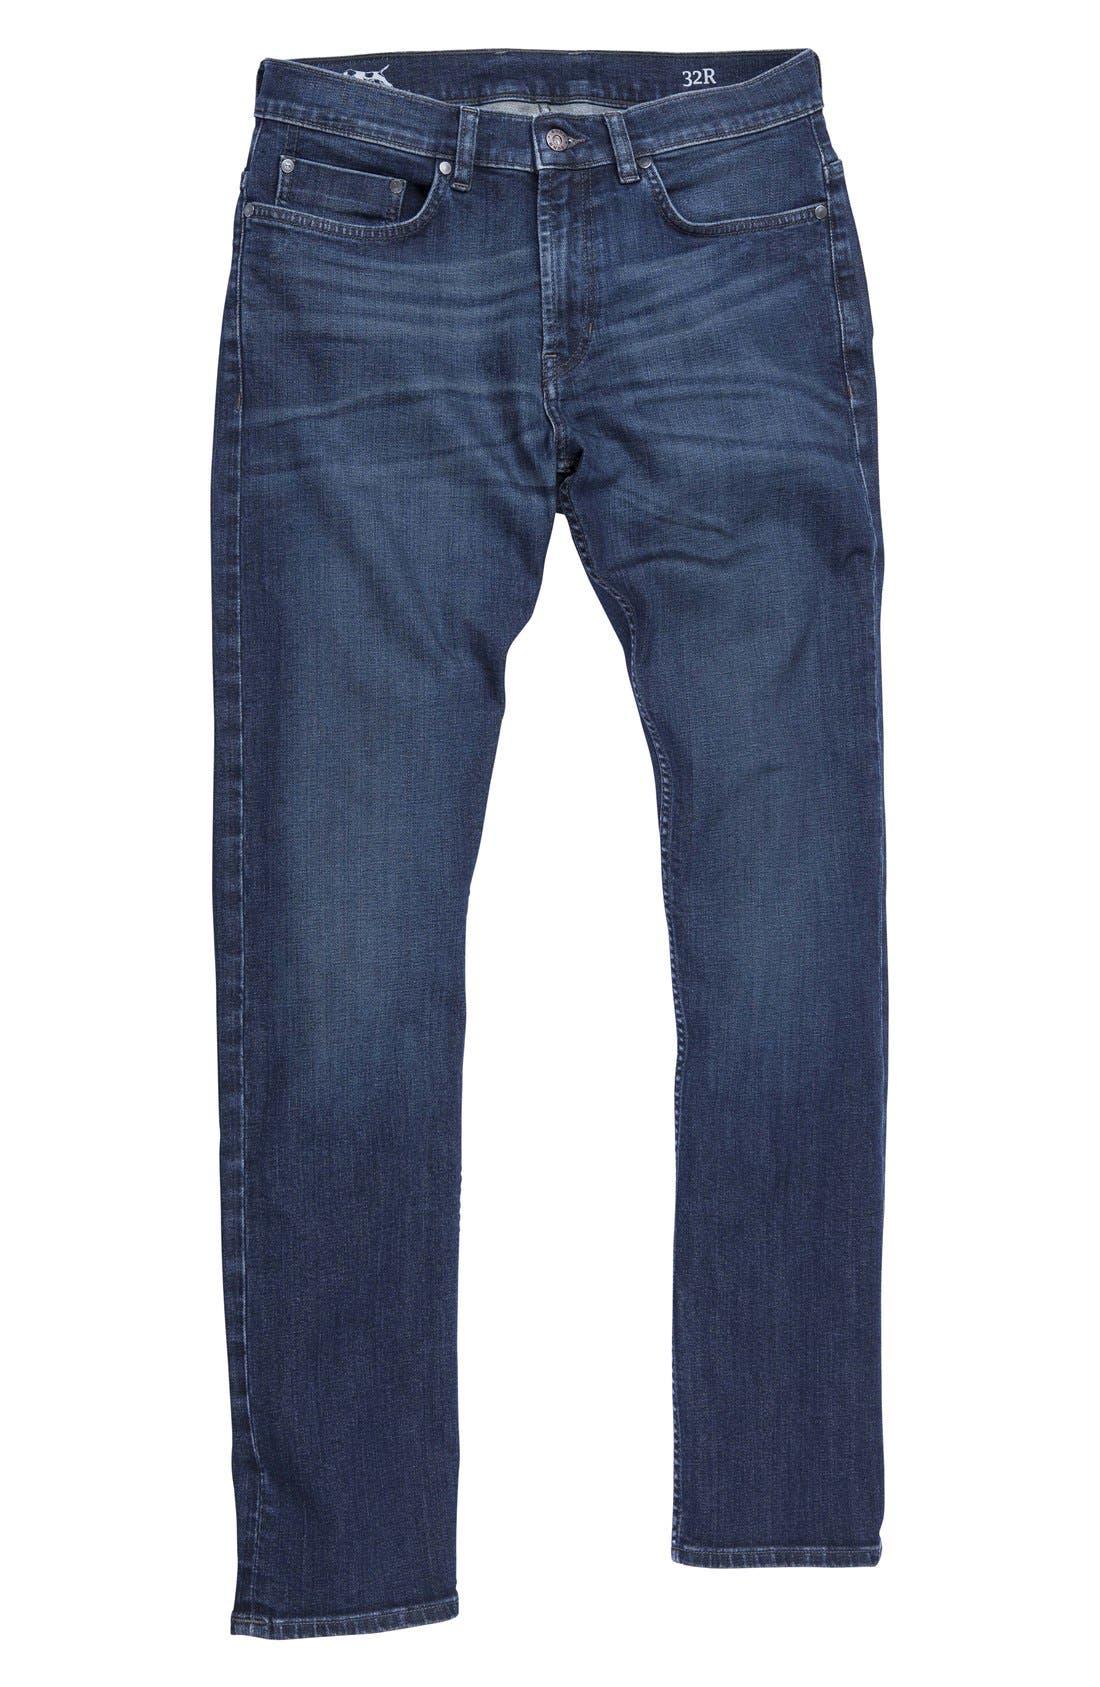 'Nicholls' Regular Fit Straight Leg Jeans,                             Alternate thumbnail 3, color,                             DENIM